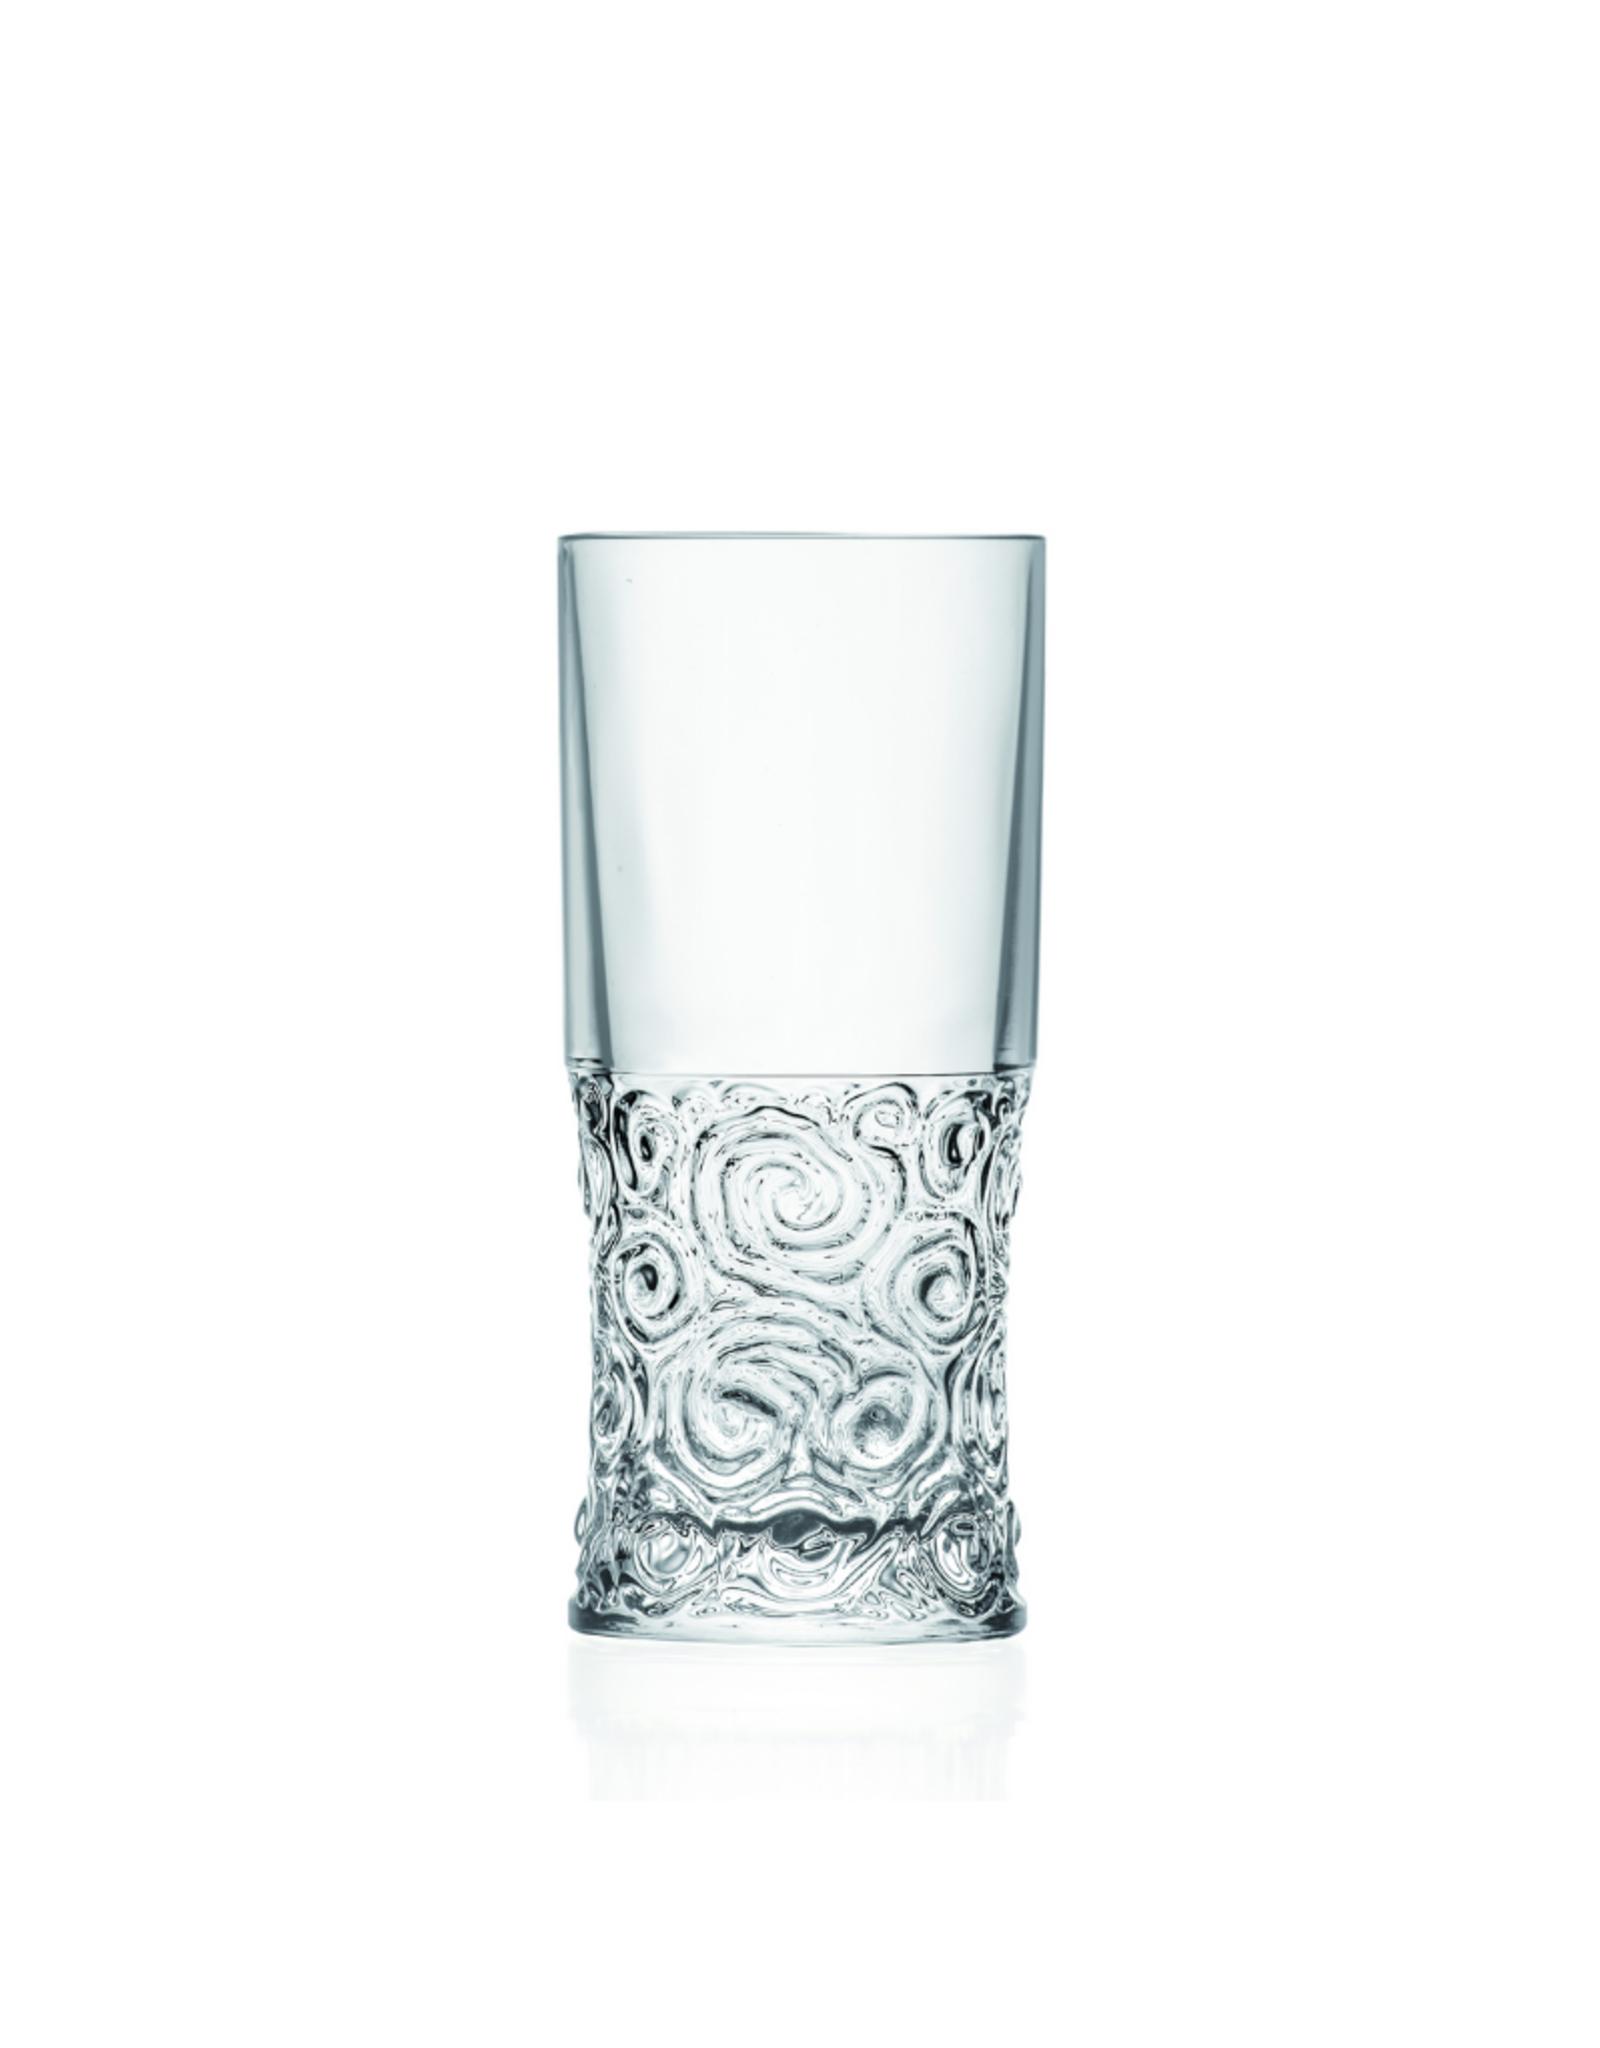 Ens. 6 verres hi-ball 12oz Eco Crystal